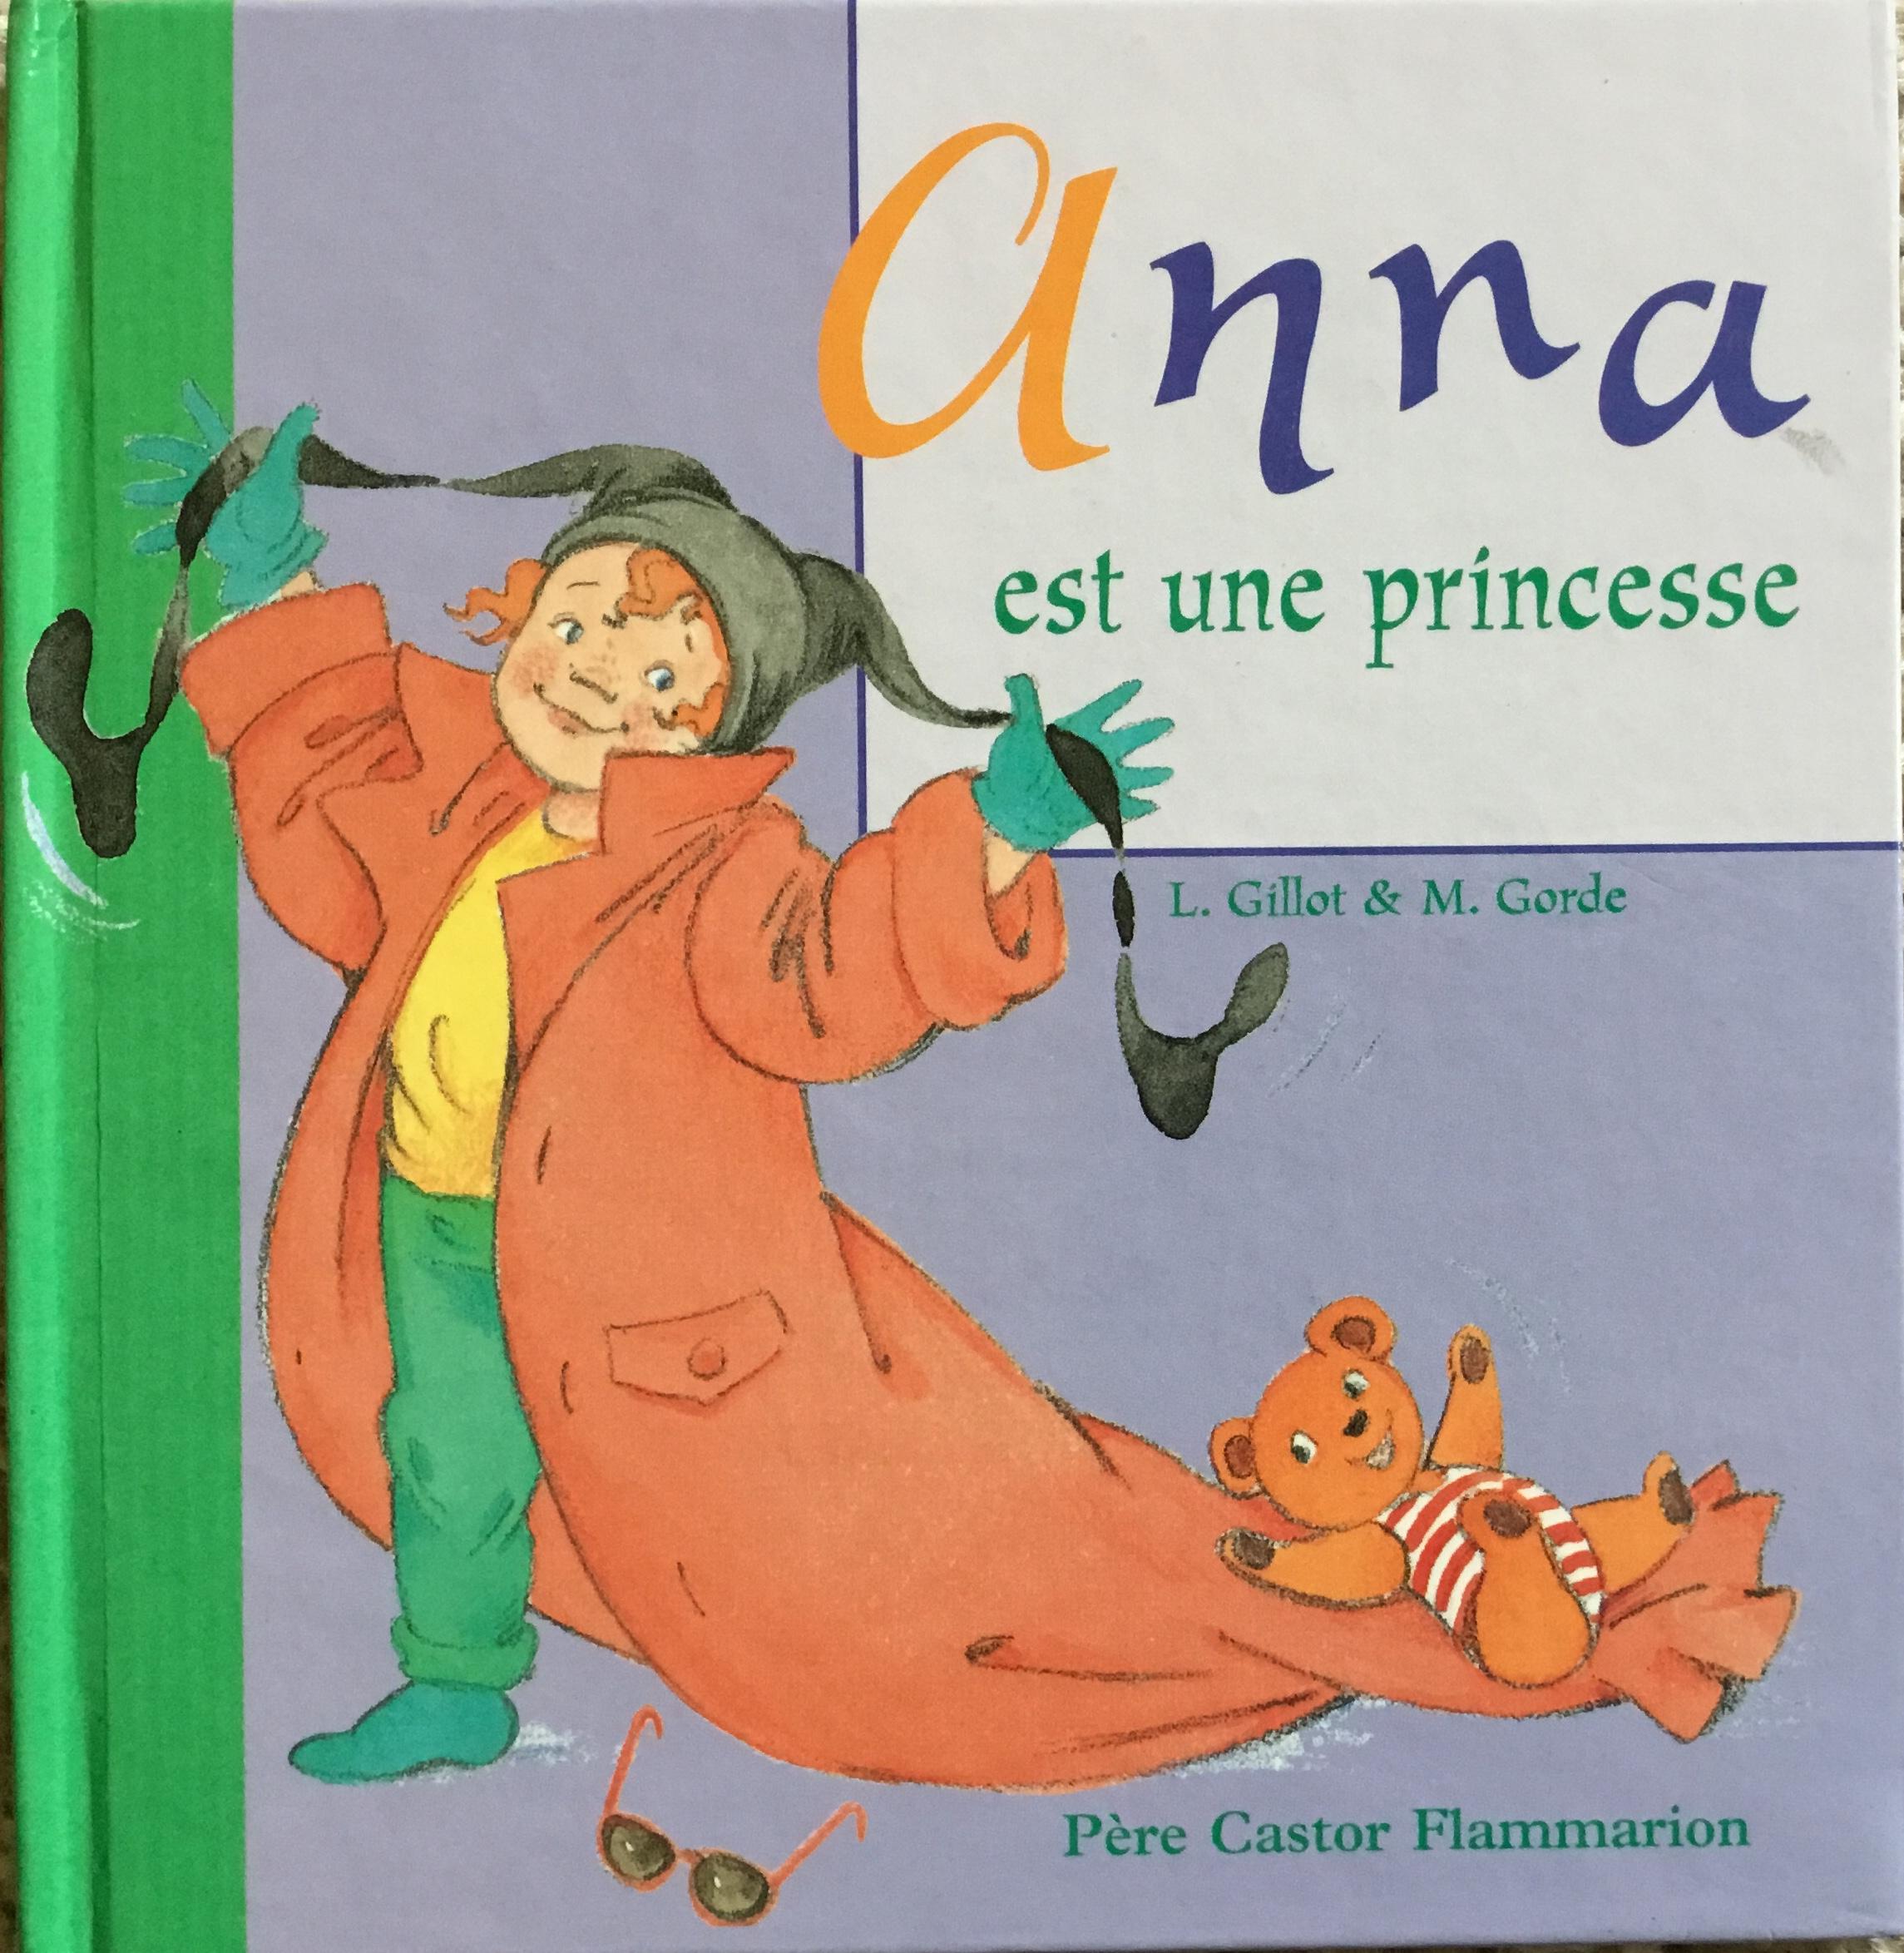 Anna est une princesse